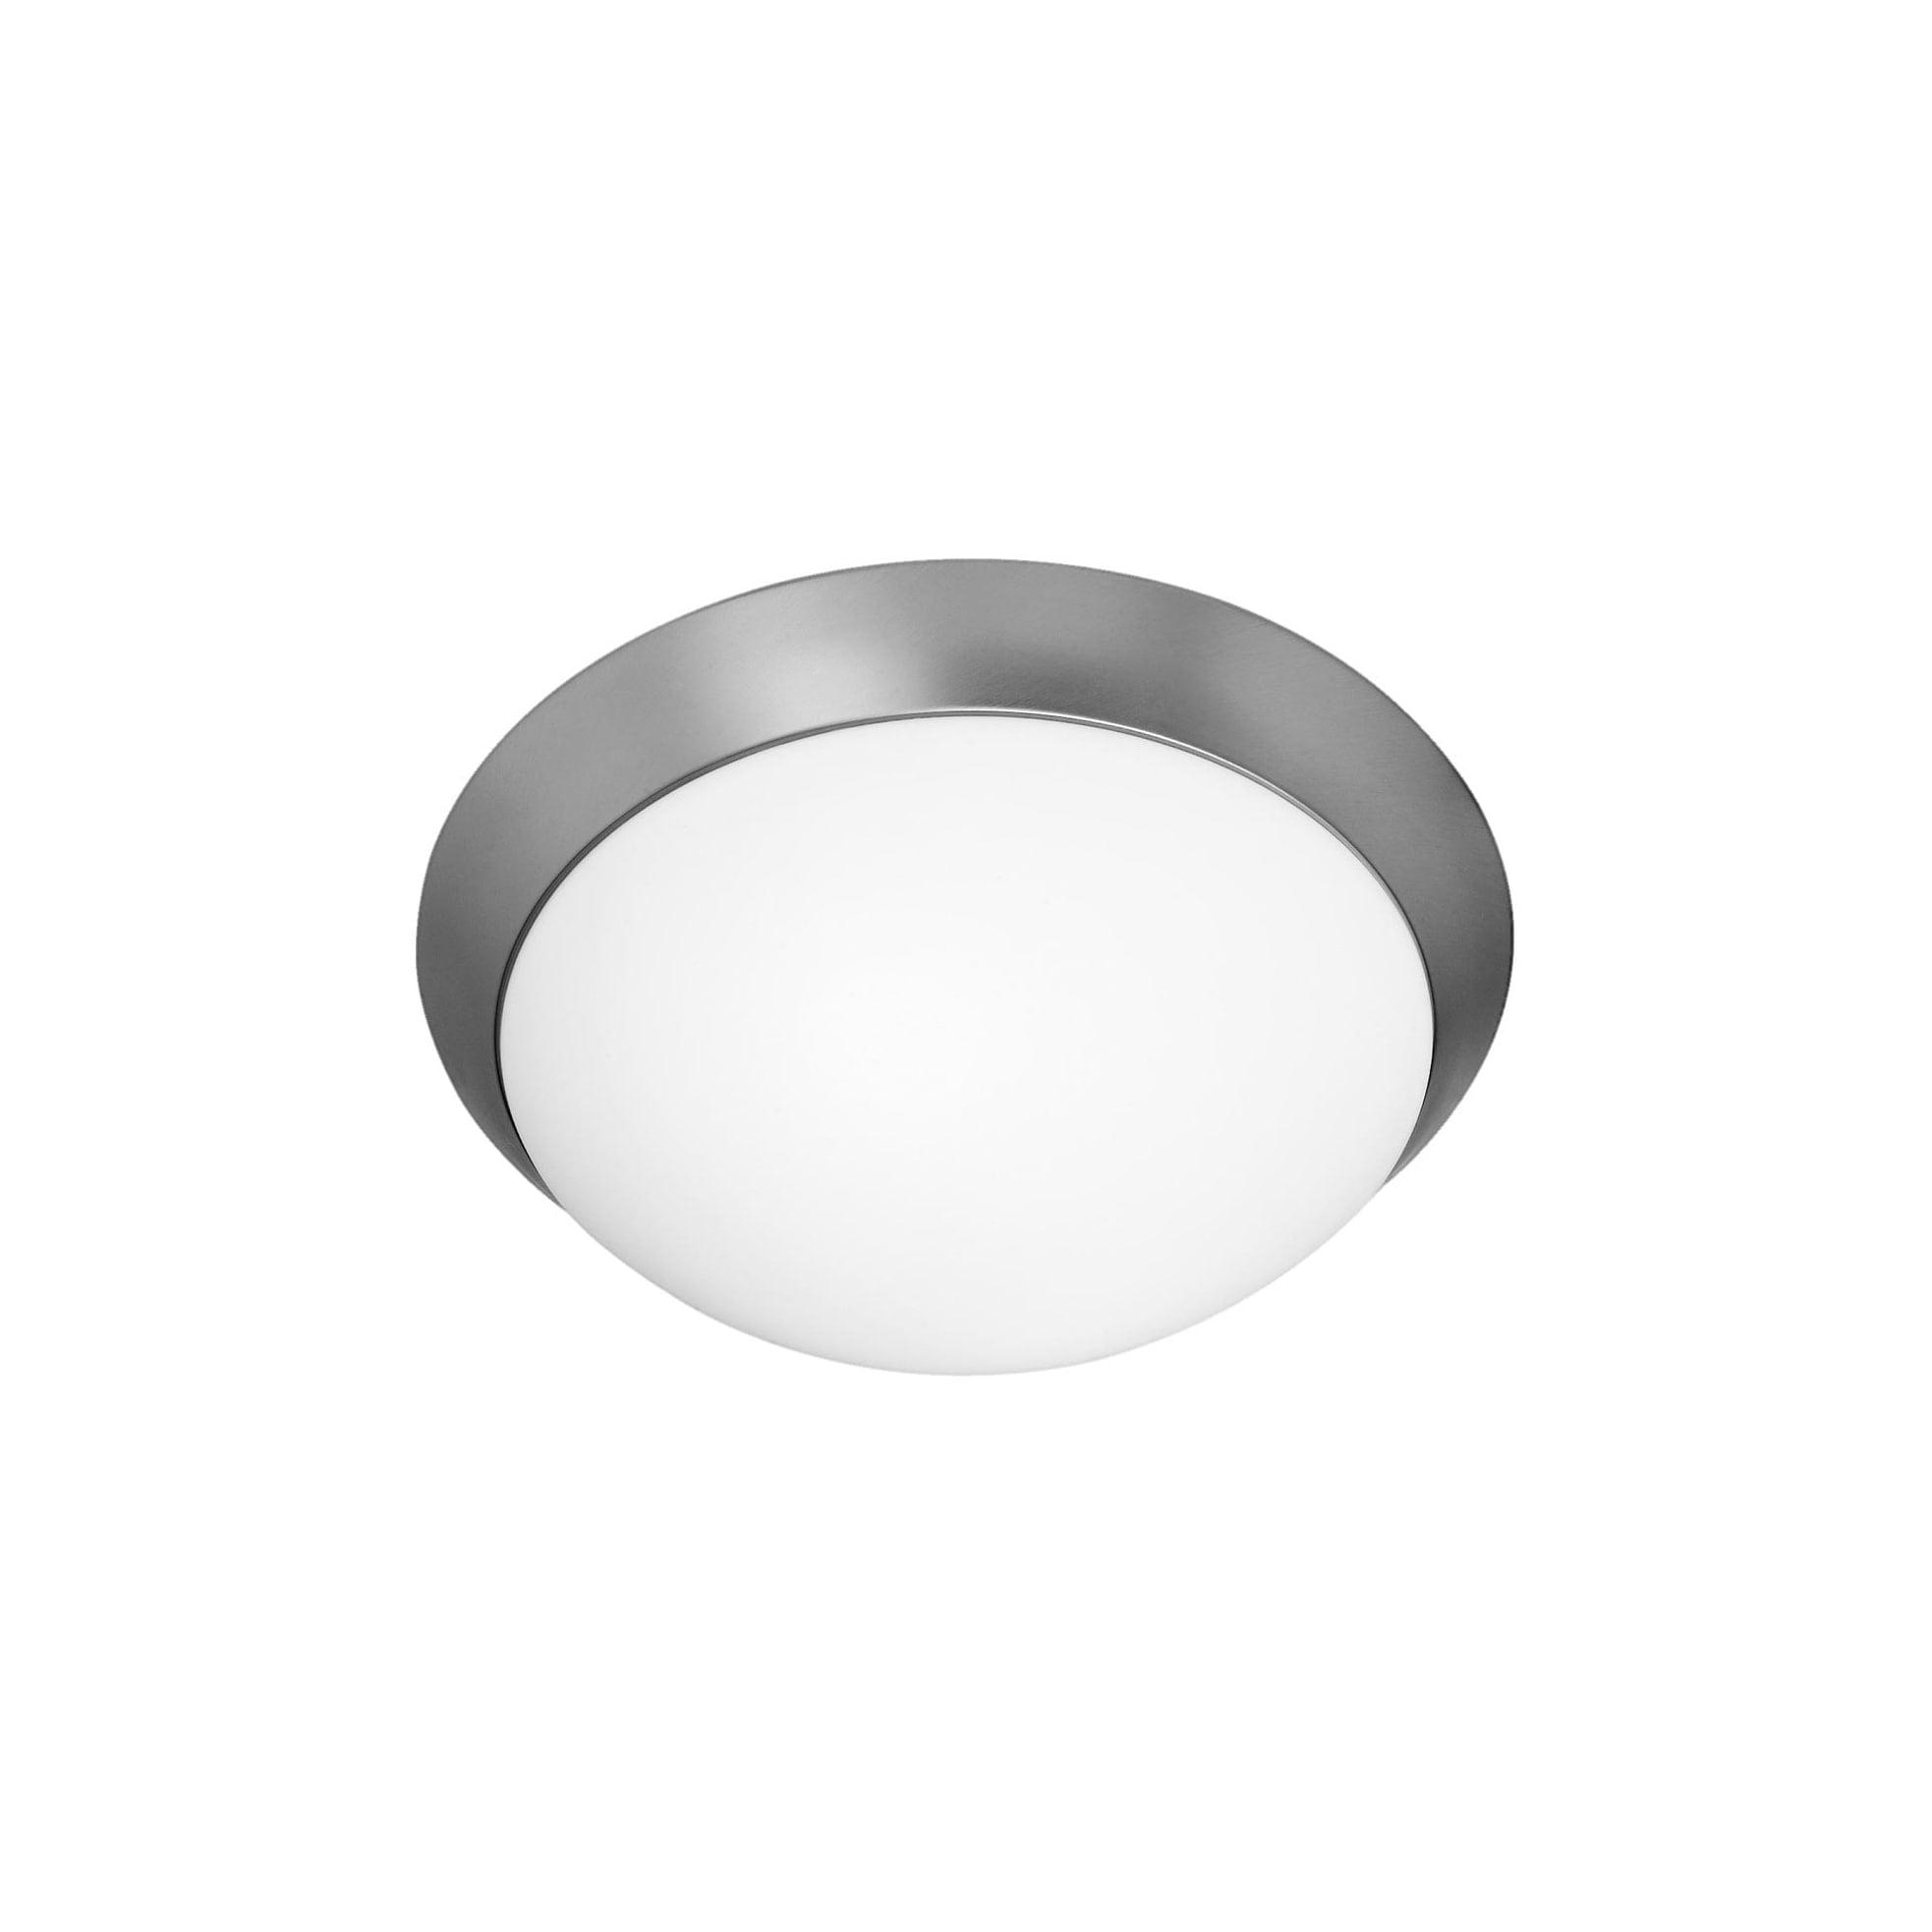 Access Lighting Cobalt 2-light 13 inch Flush Mount by Overstock